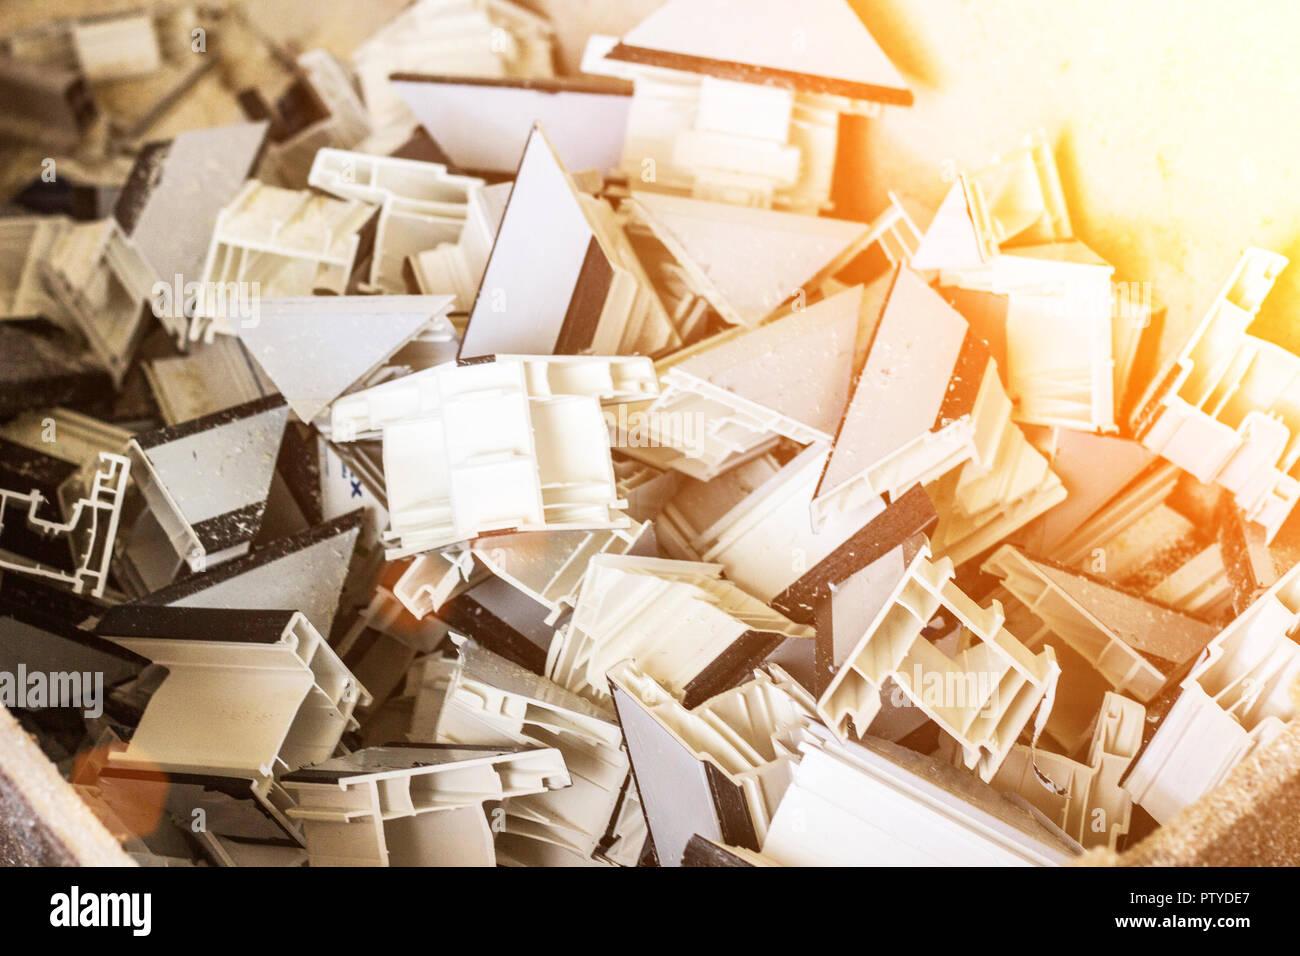 Ventanas Pvc Stock.Production Of Pvc Windows Plastic Profile Waste After